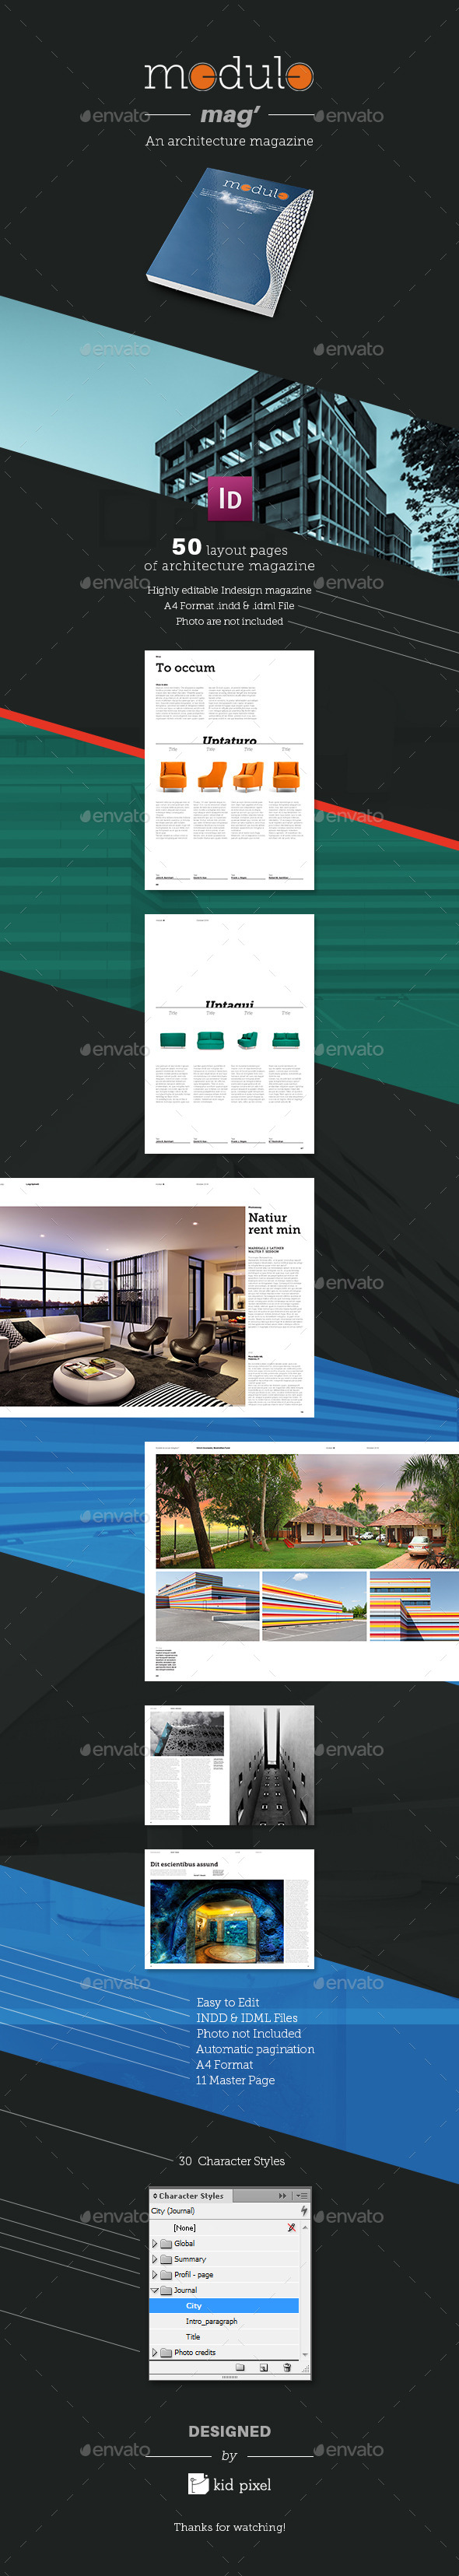 Modulo Mag - An architecture magazine - Magazines Print Templates